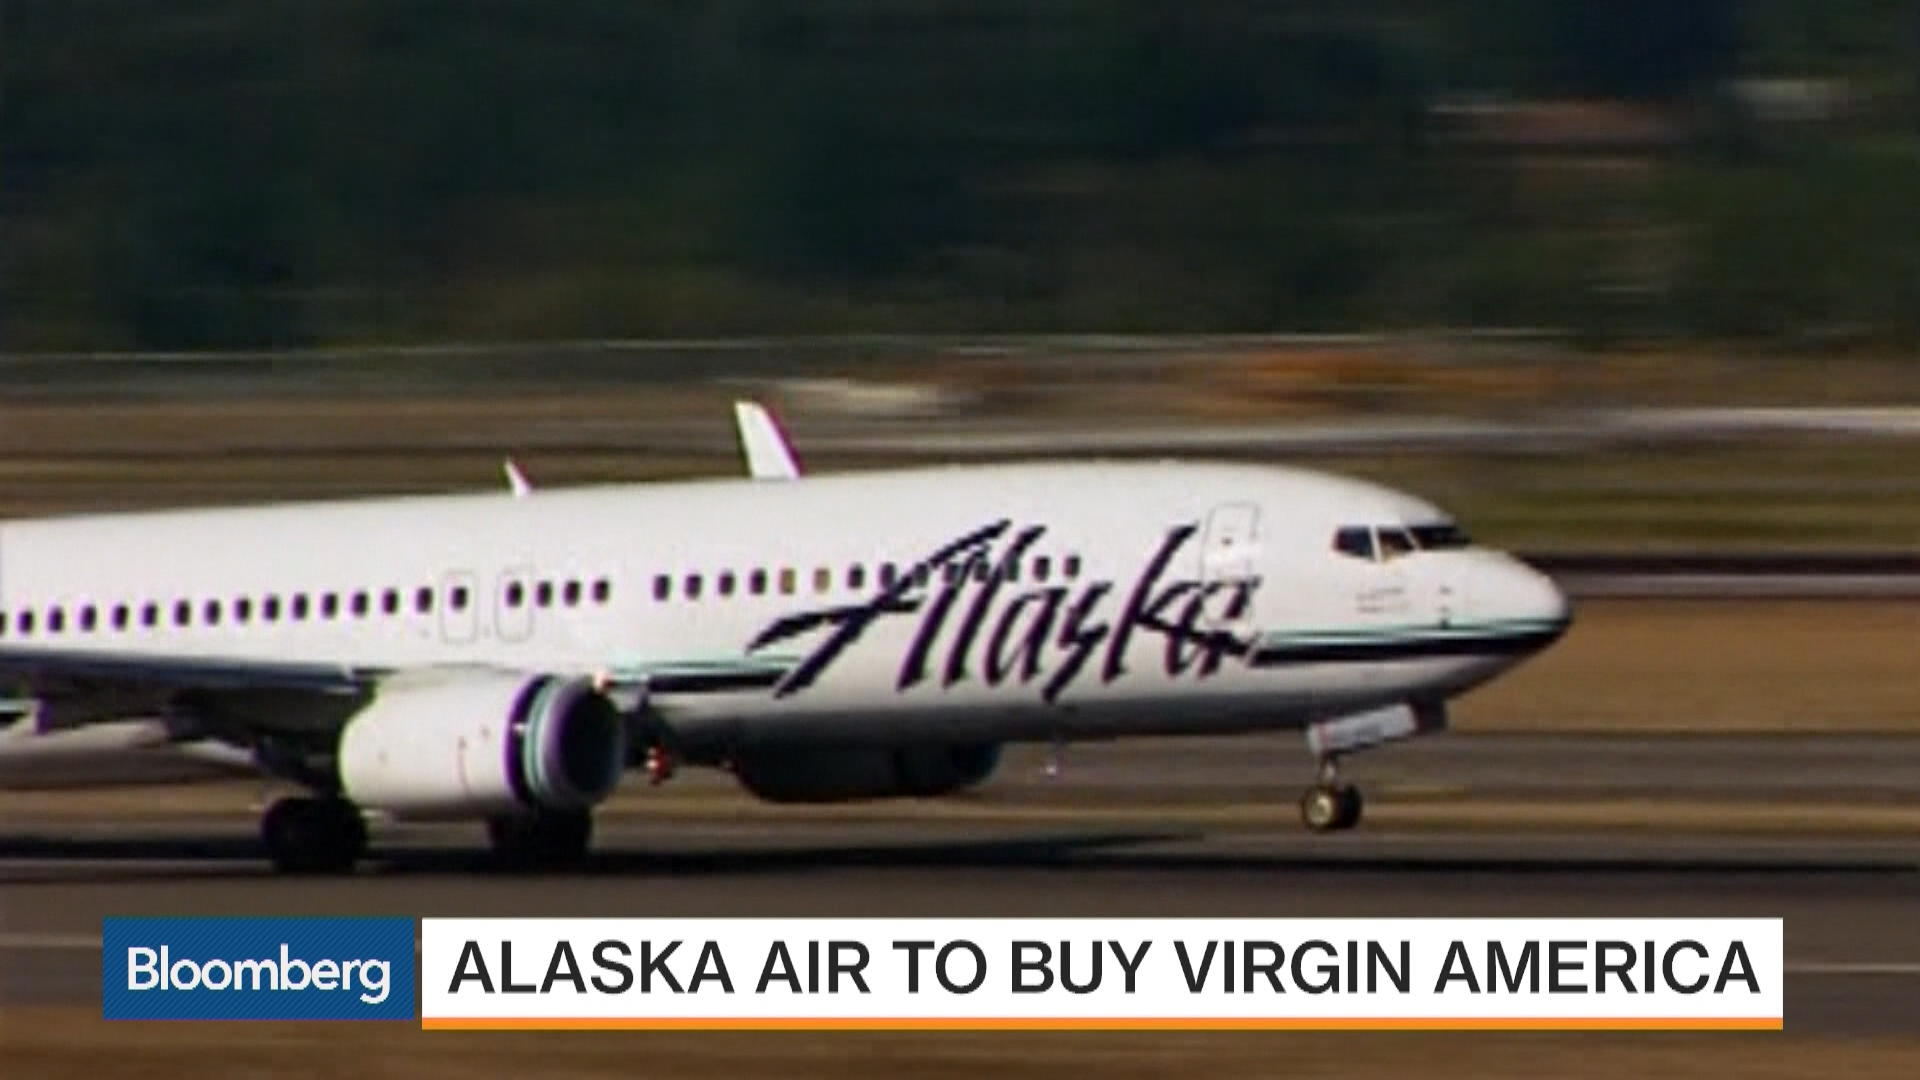 Alknew York Stock Quote Alaska Air Group Inc Bloomberg Markets